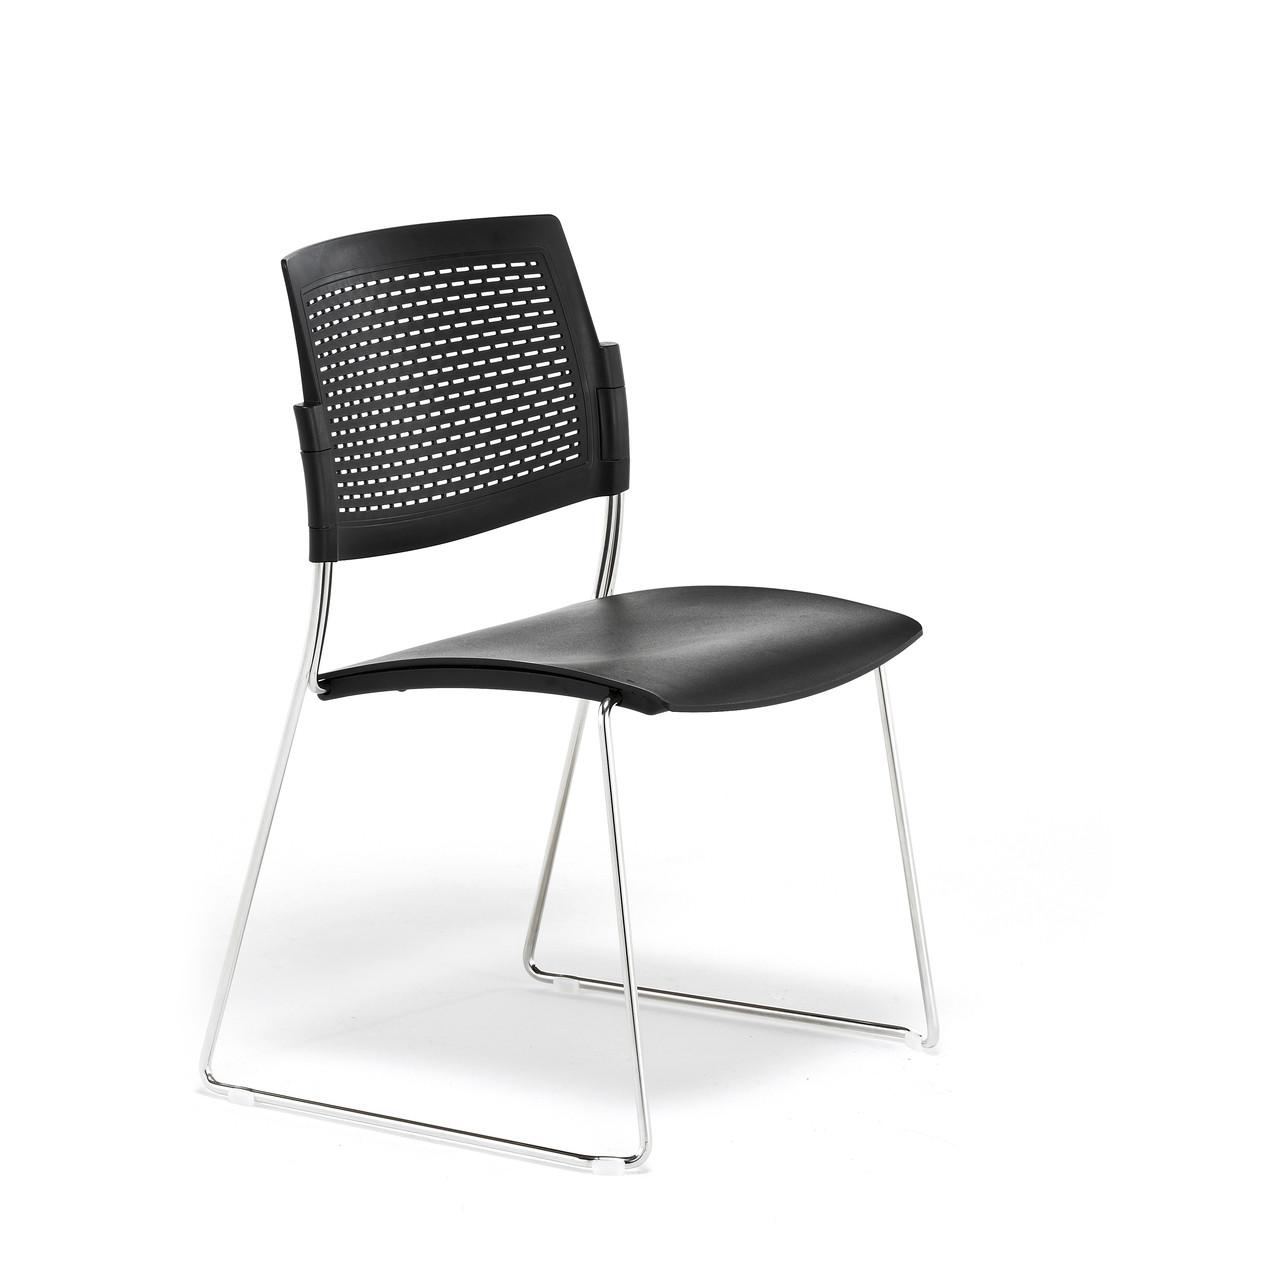 Satsu Skid - Meeting & Visitor Chairs - MSS01